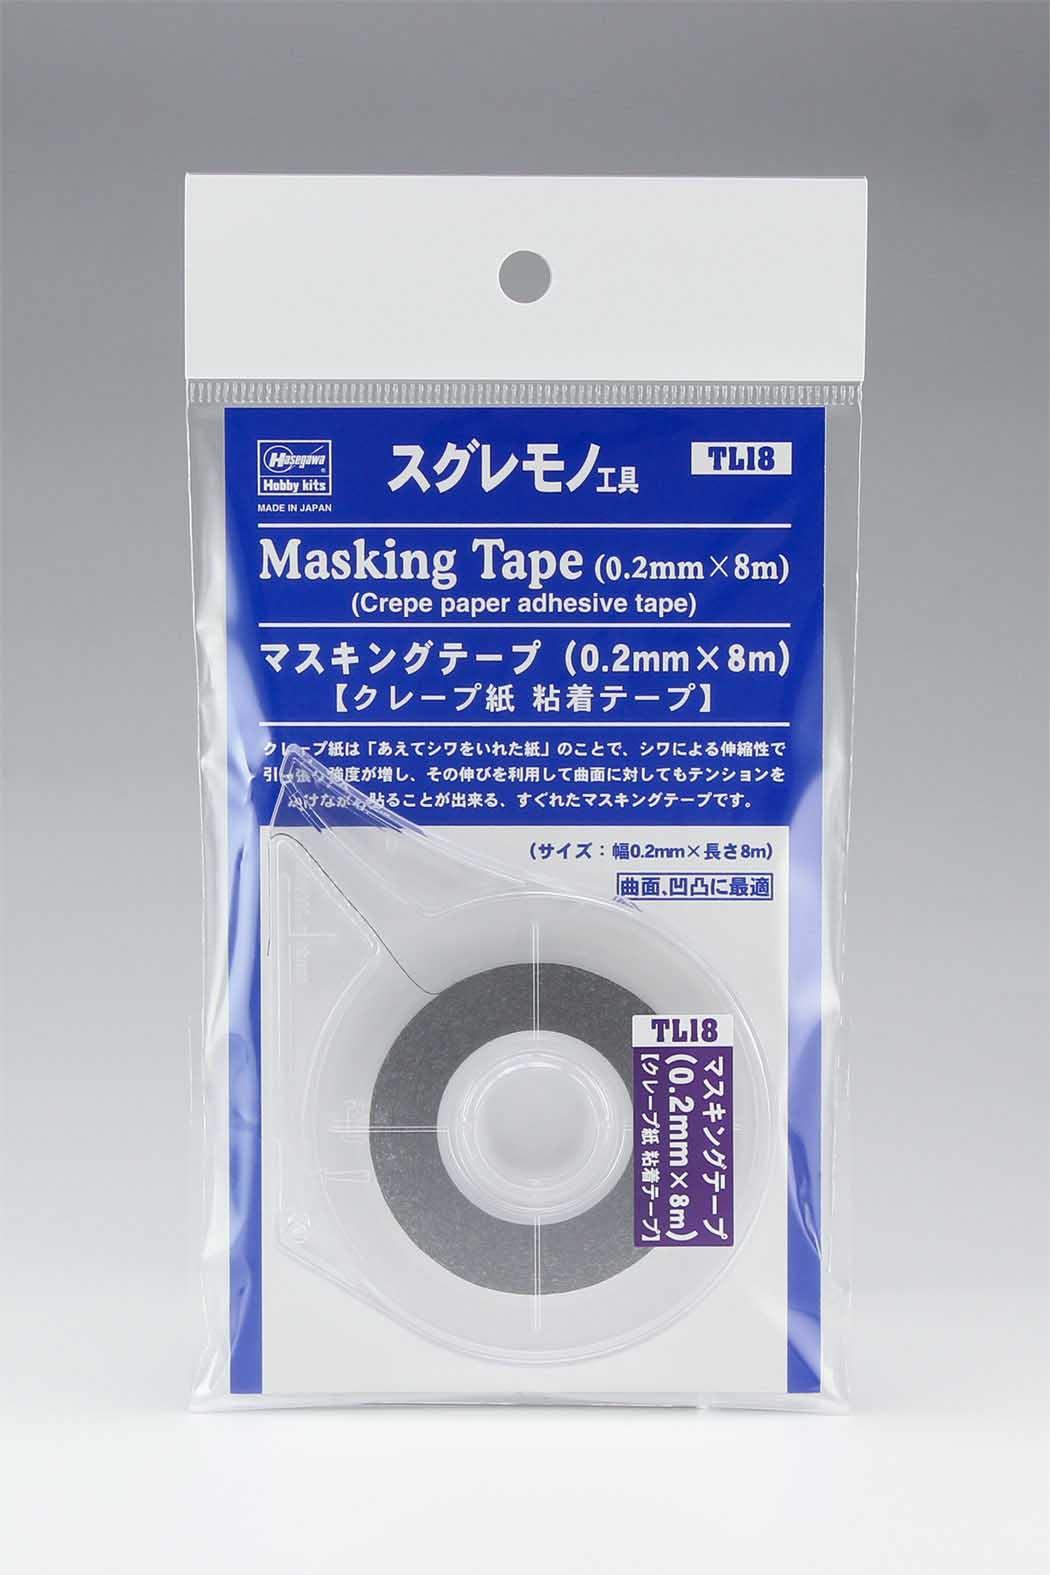 Hasegawa Masking Tape (0.2Mm X 8M)